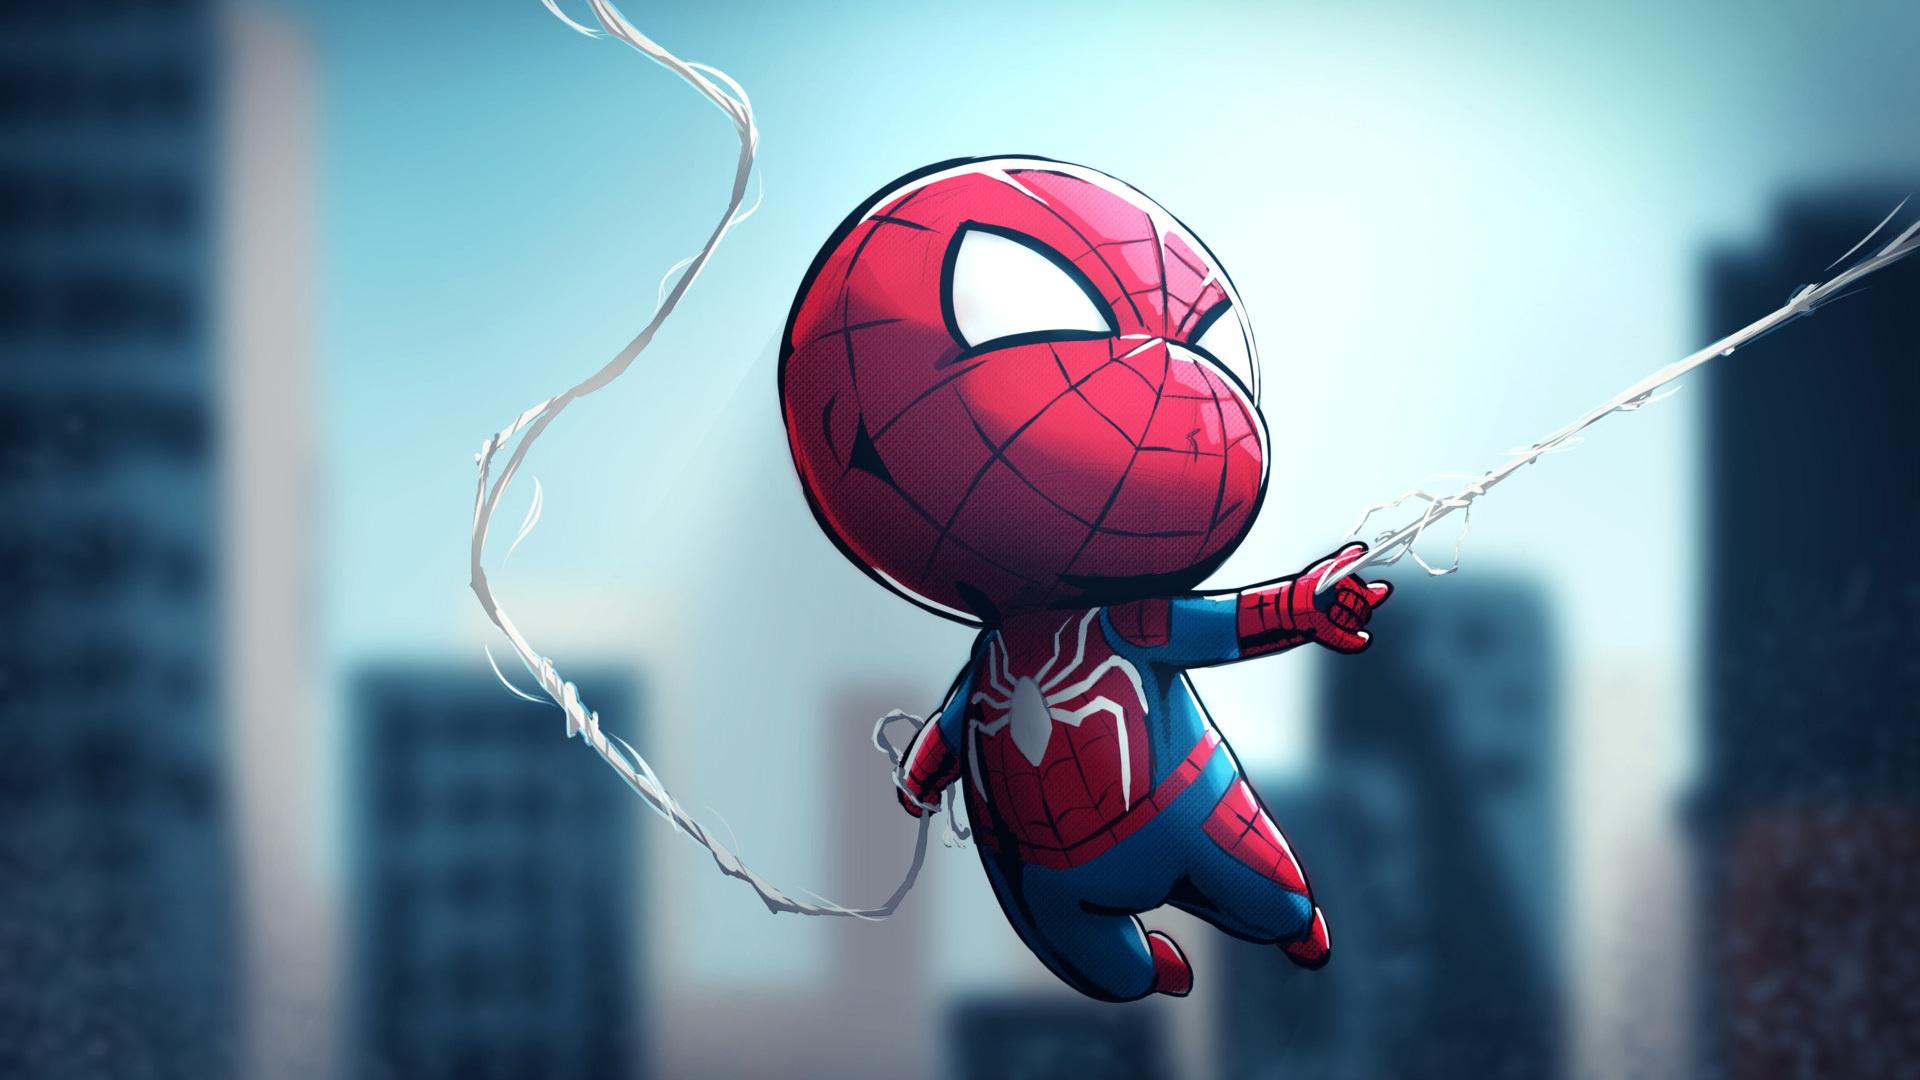 1920x1080 Chibi Spiderman Laptop Full HD 1080P HD 4k ...